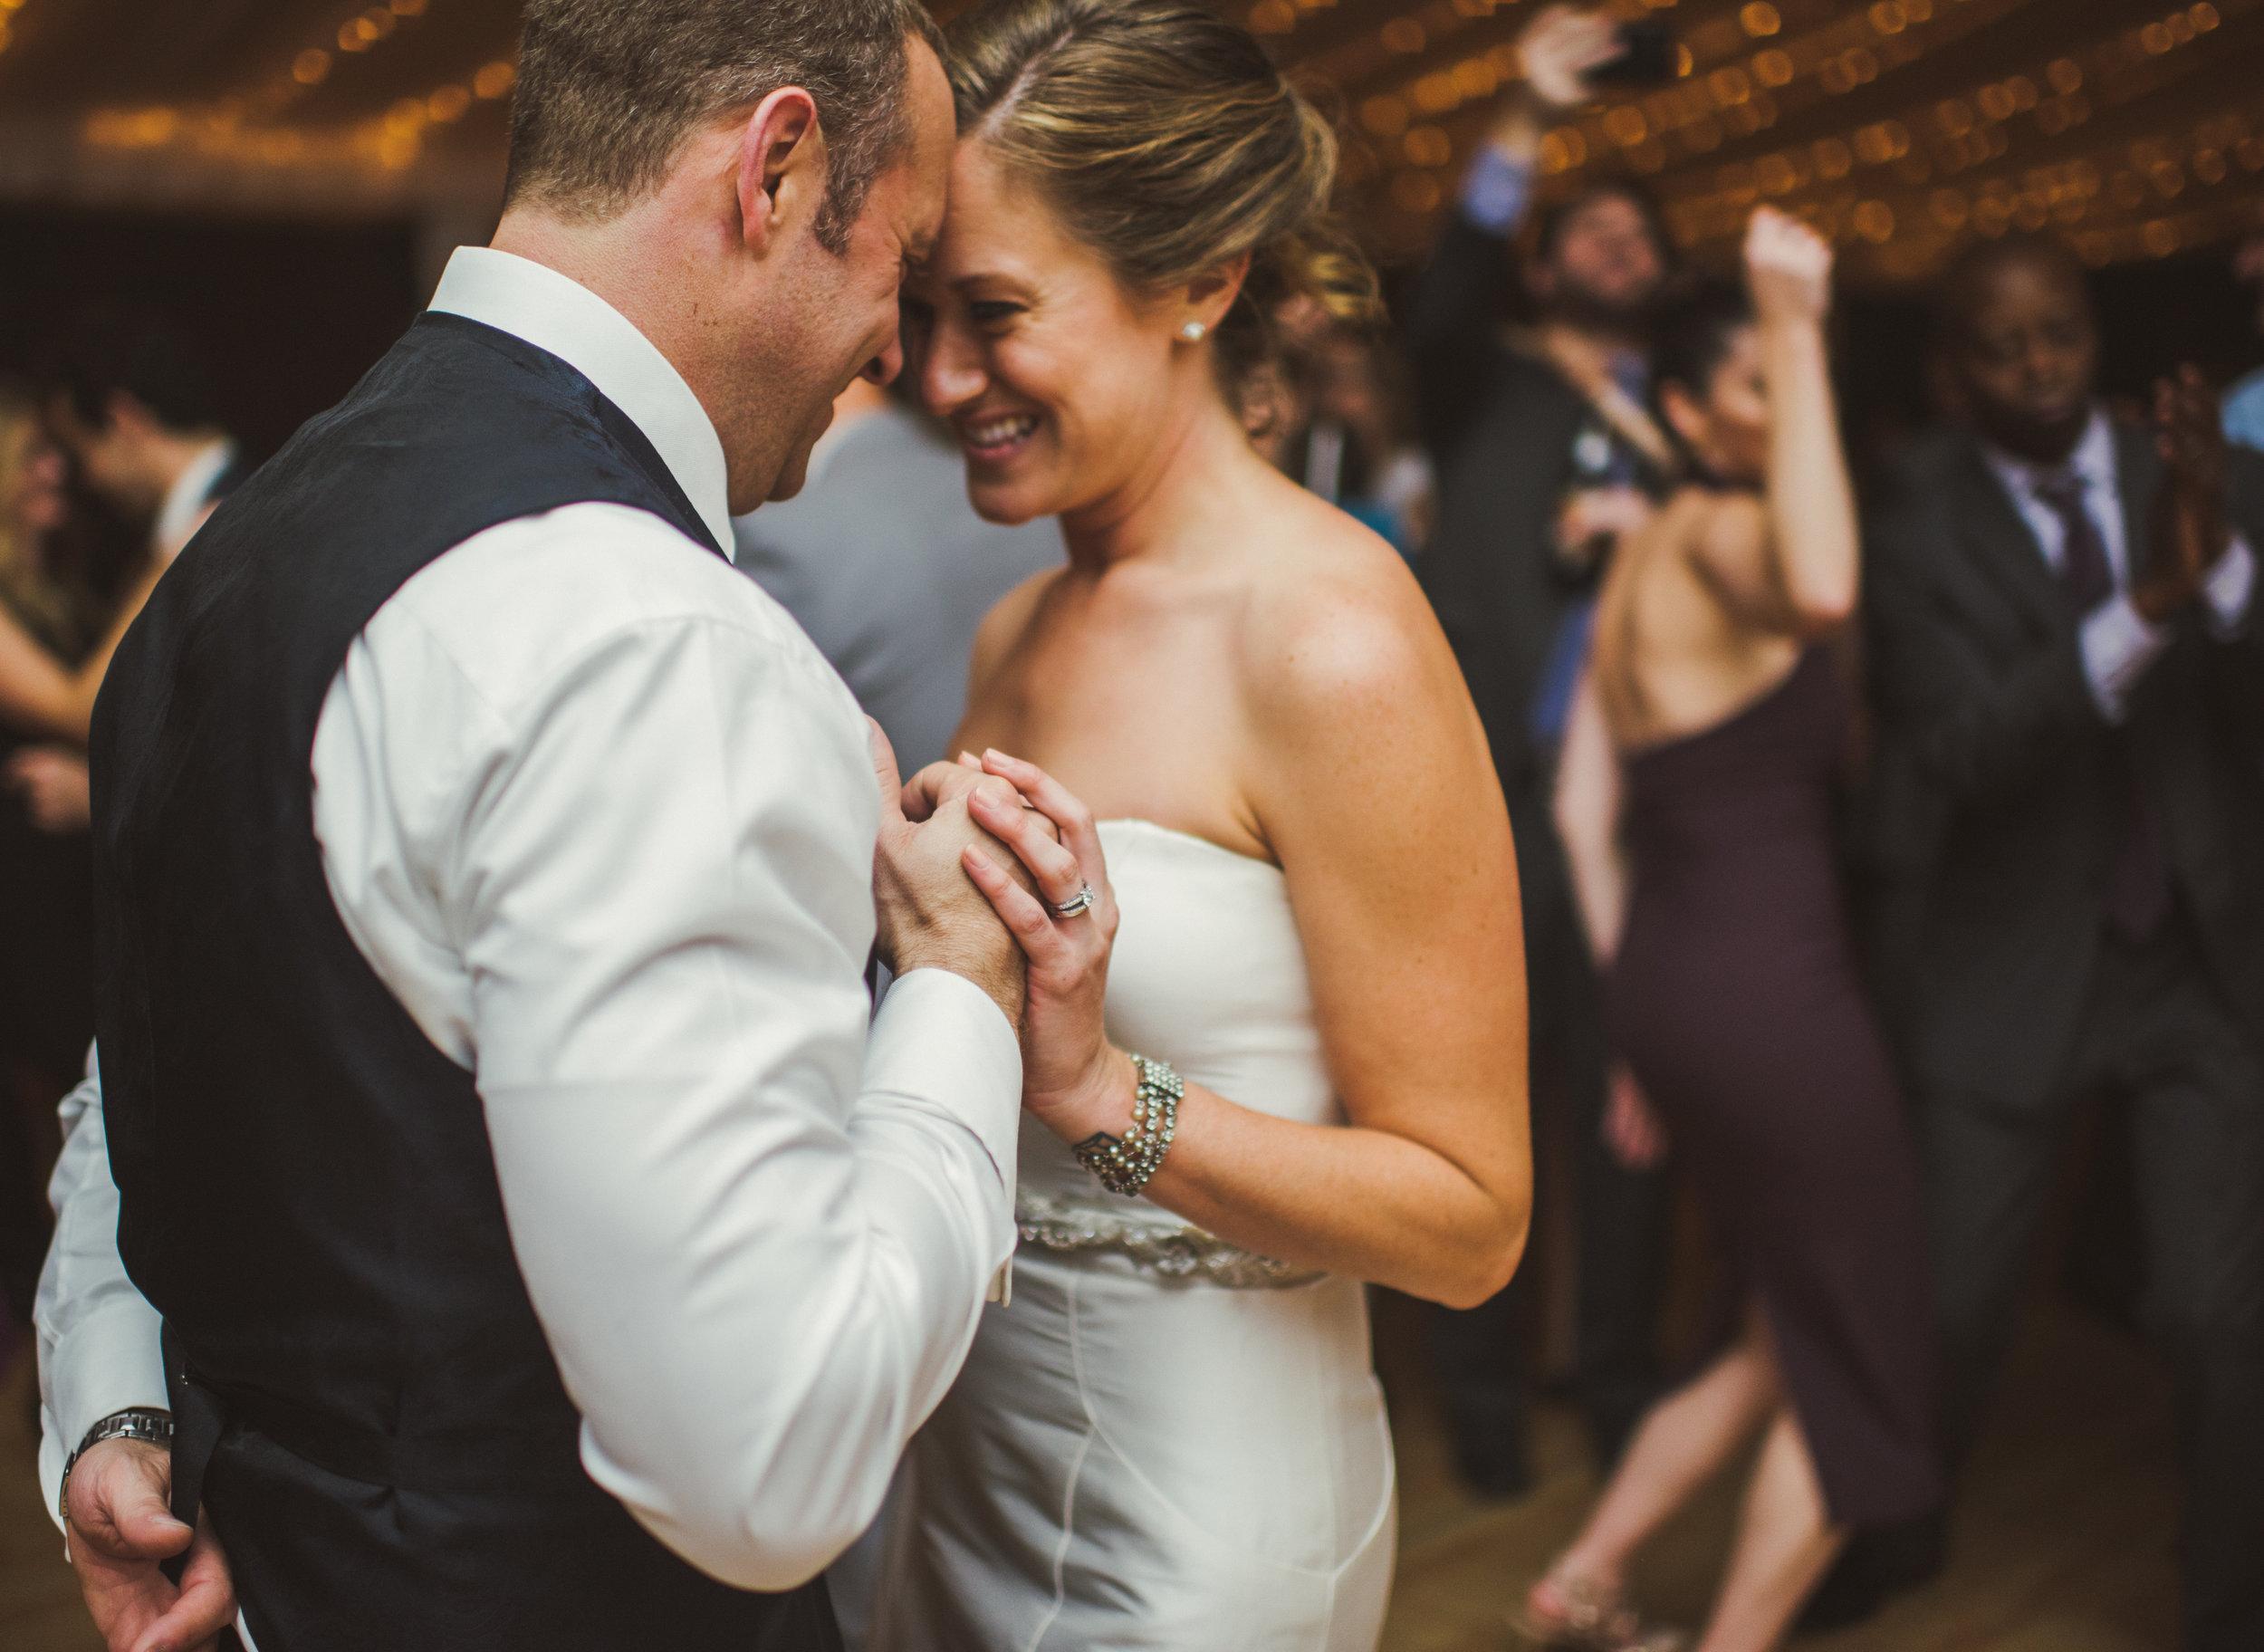 JACQUELINE & ANDREW WARSHAWER -BROOKMILL FARM FALL WEDDING - INTIMATE WEDDING PHOTOGRAPHER - TWOTWENTY by CHI-CHI AGBIM-816.jpg